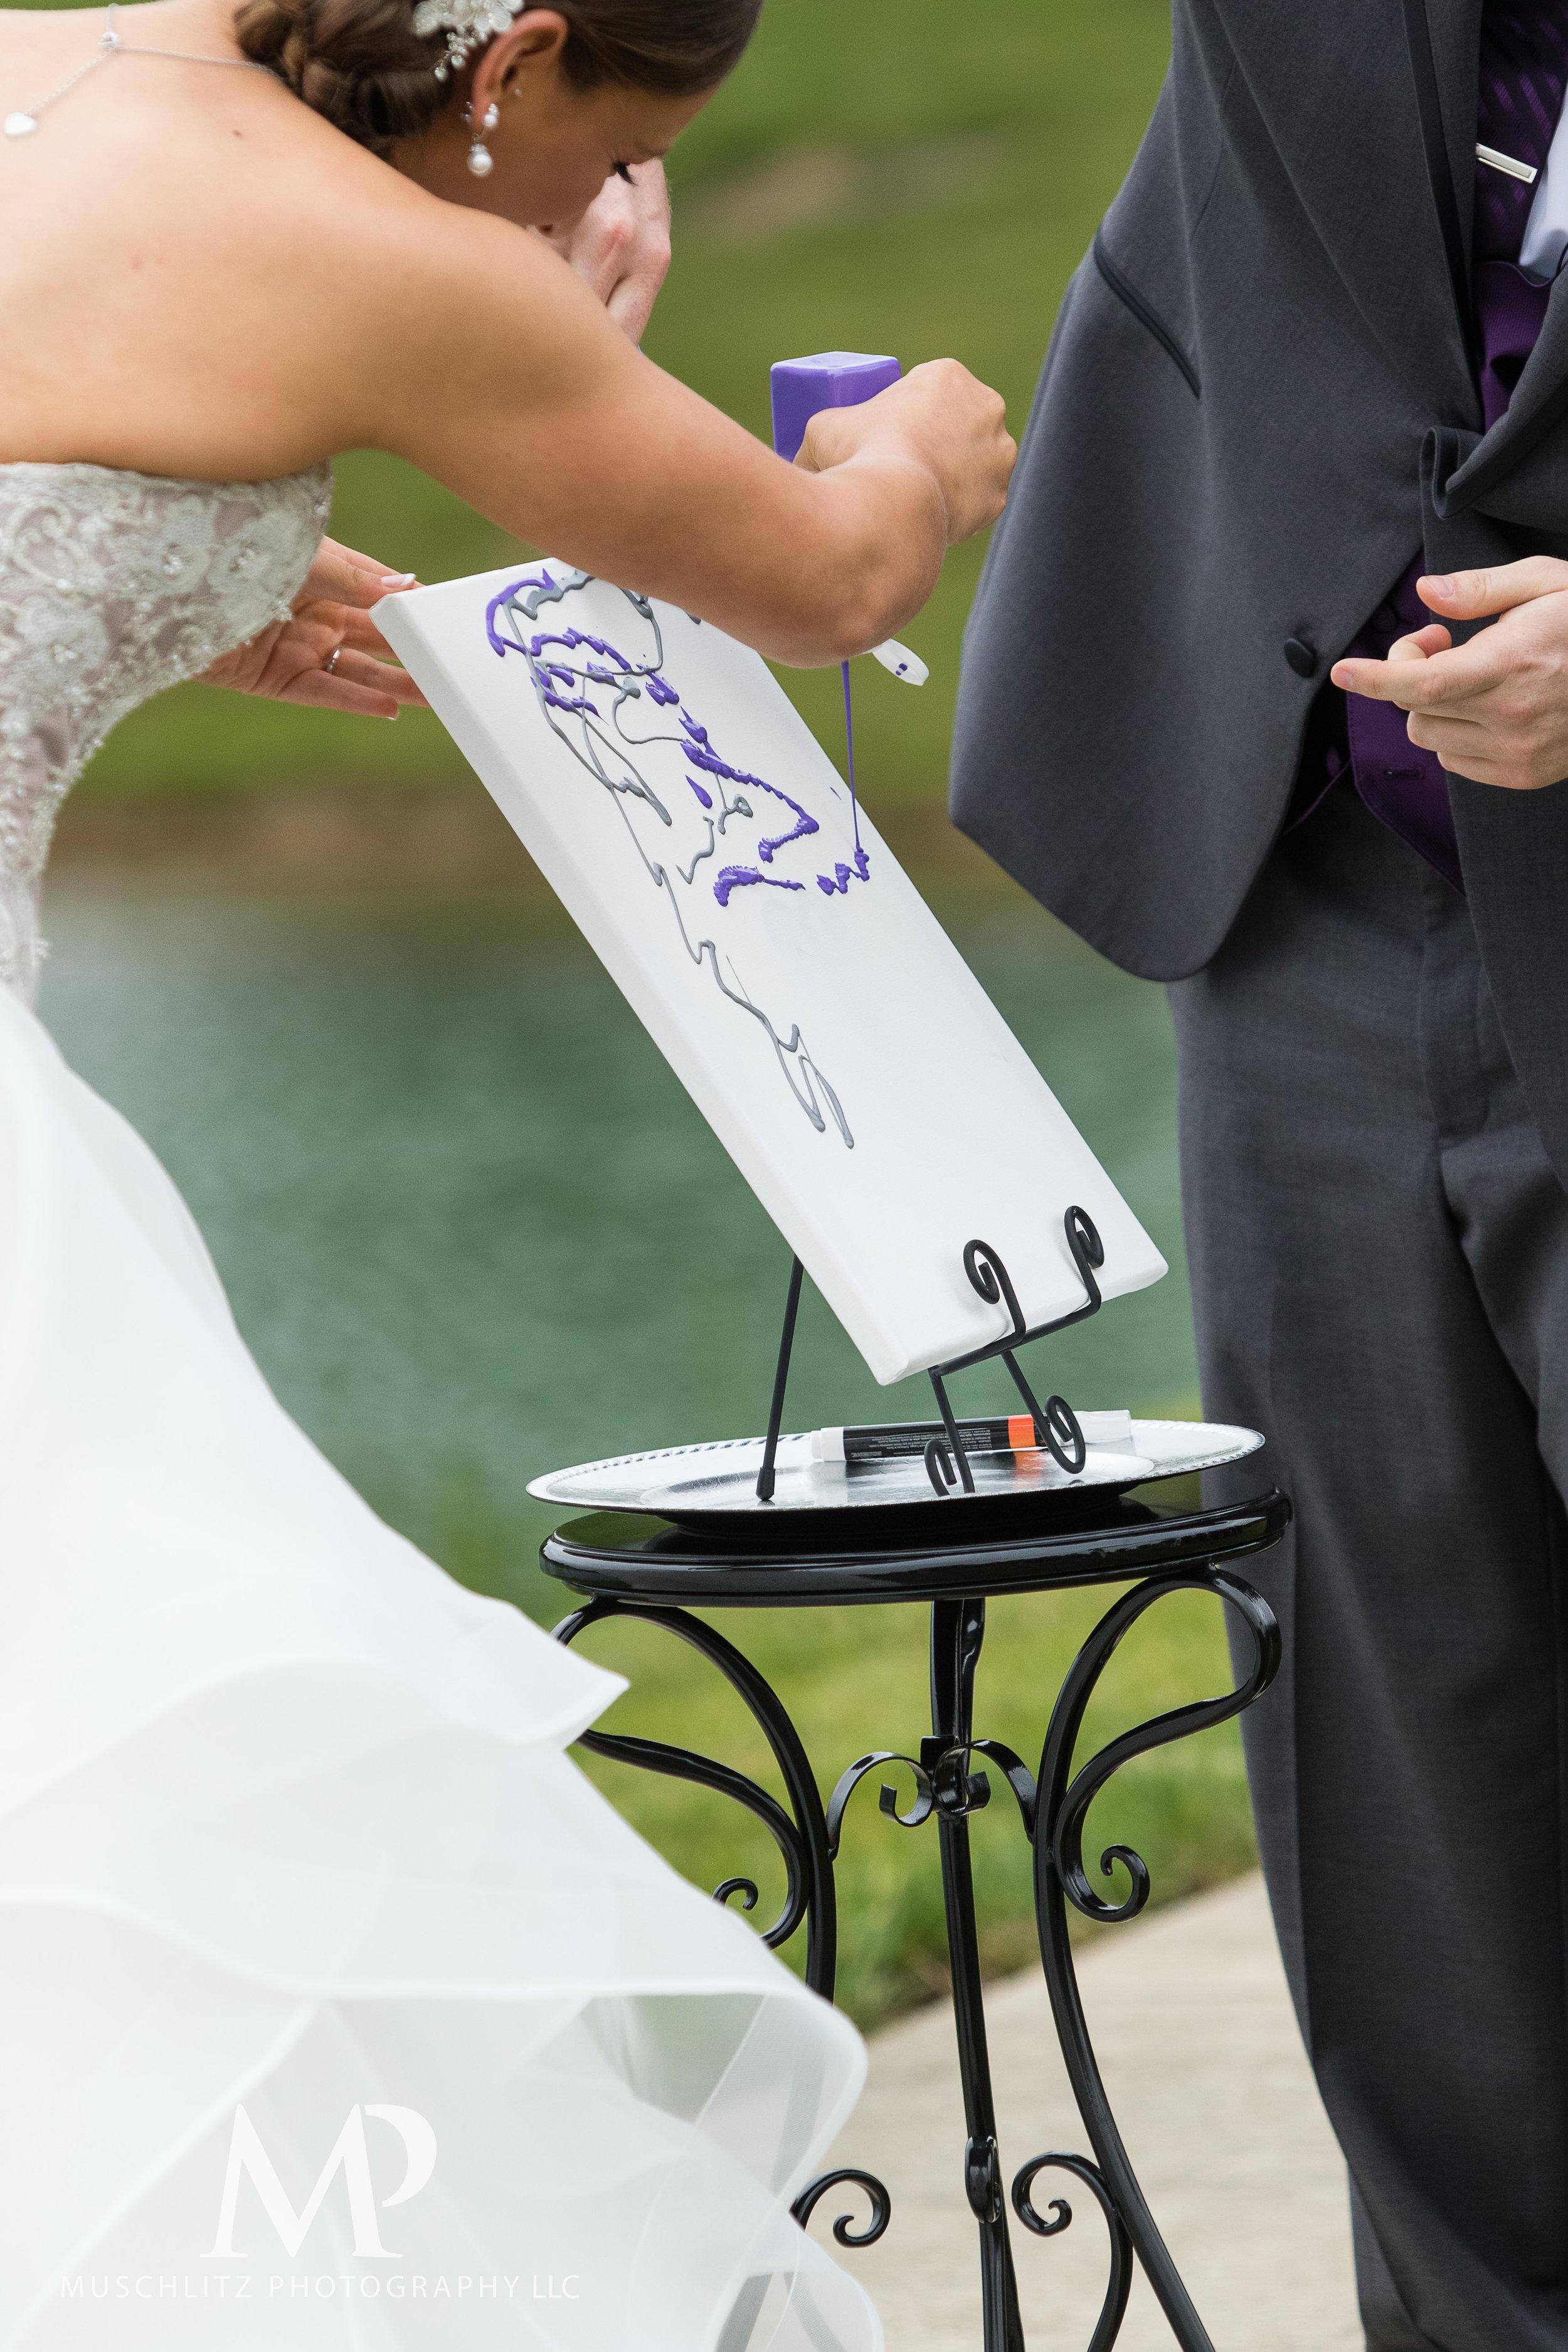 club-at-corazon-wedding-ceremony-reception-columbus-dublin-ohio-ohio-university-theme-036.JPG